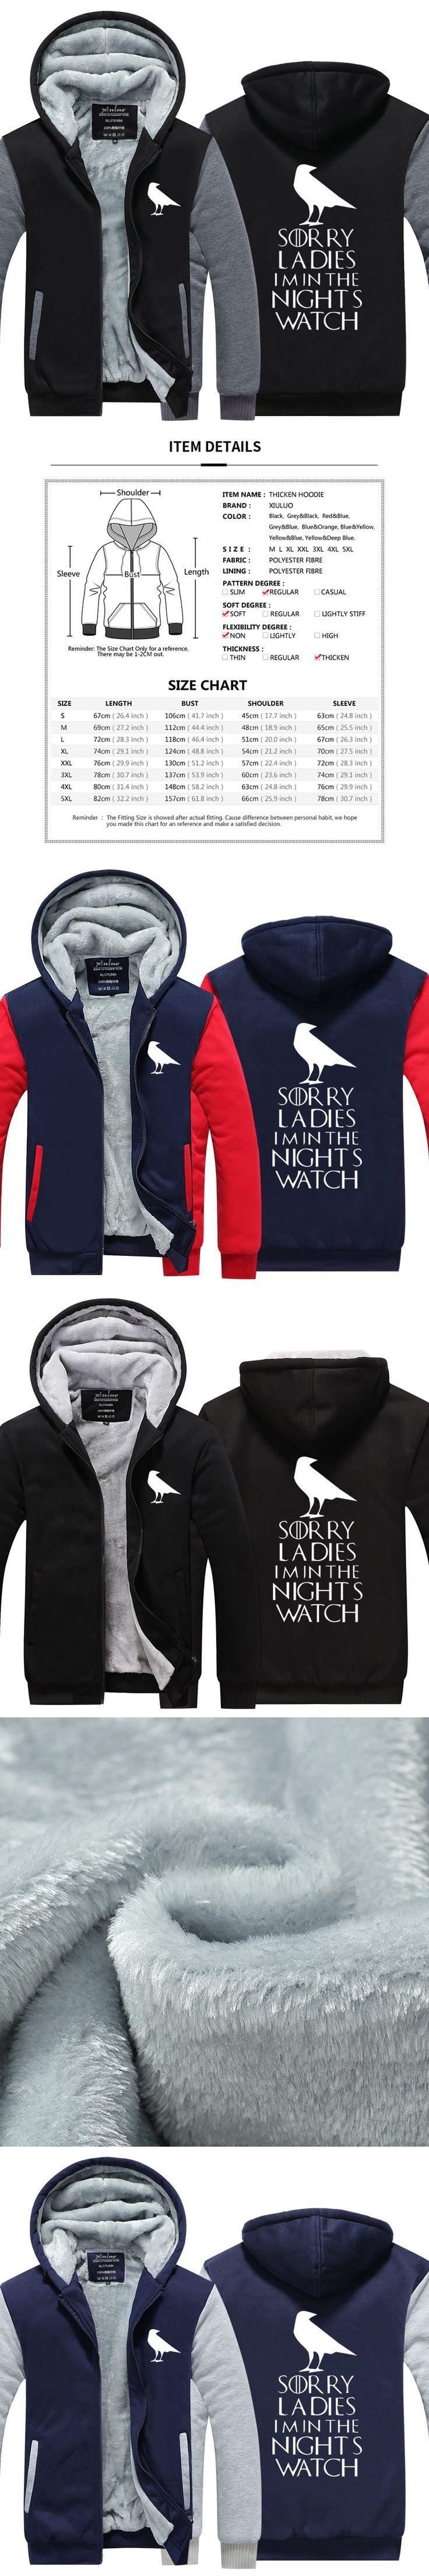 2017 Winter Hoodies Men Sorry Ladies I'm In Nights Watch Game Of Thrones Thicken Zip up Fleece Jacket USA size Plus size